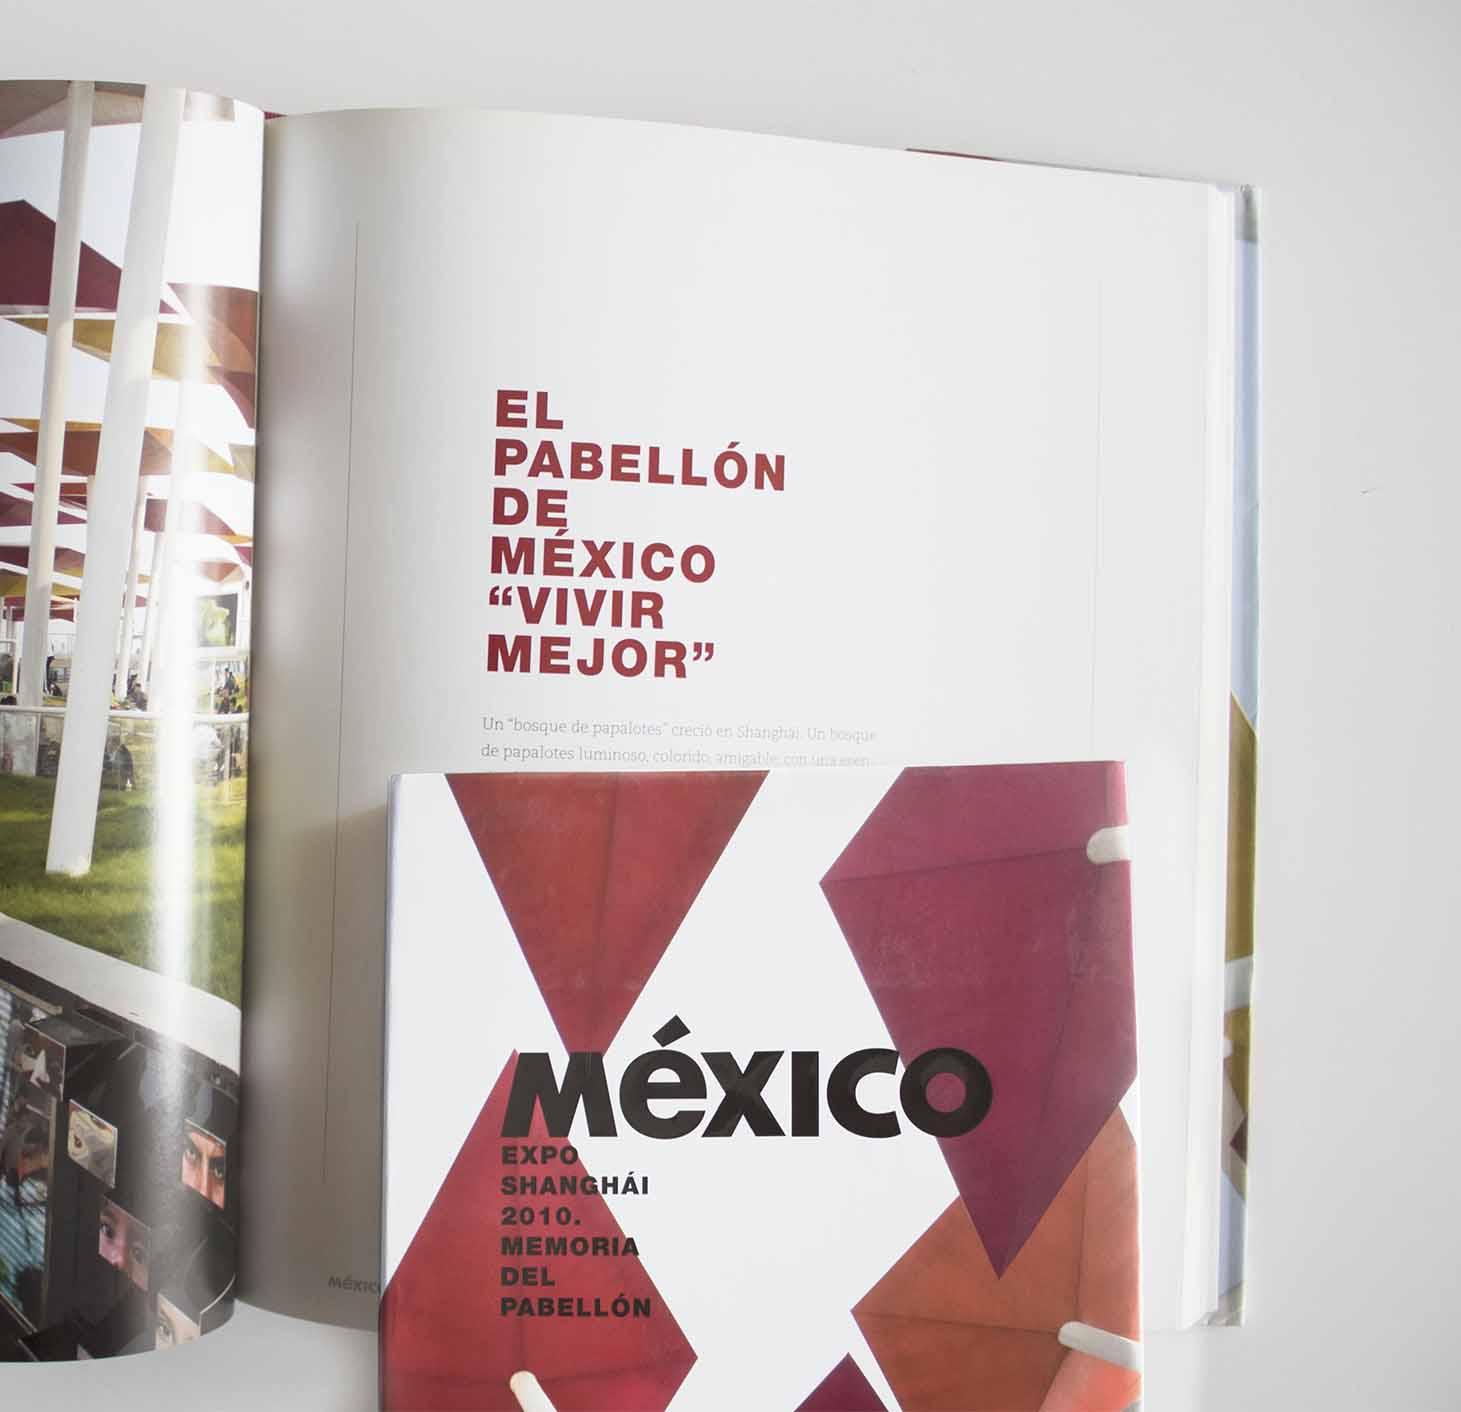 PROMÉXICO PUBLISHED THE MEMORIES OF THE MEXICAN PAVILION : SLOT